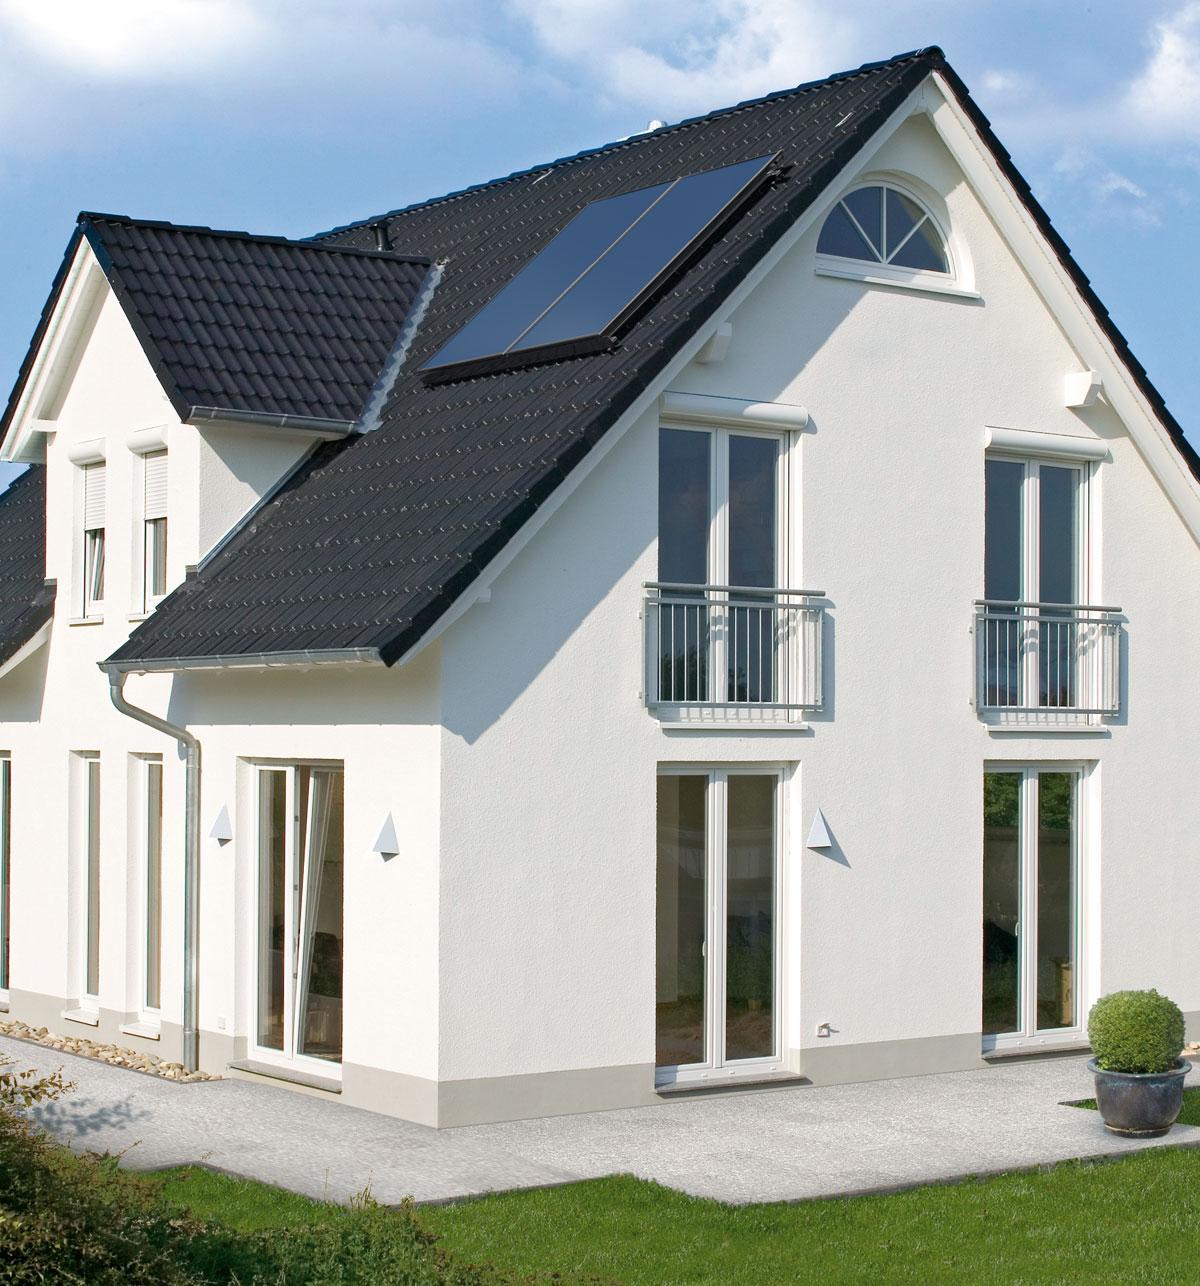 kunststofffenster mit 3 fach verglasung heka fenster t ren. Black Bedroom Furniture Sets. Home Design Ideas